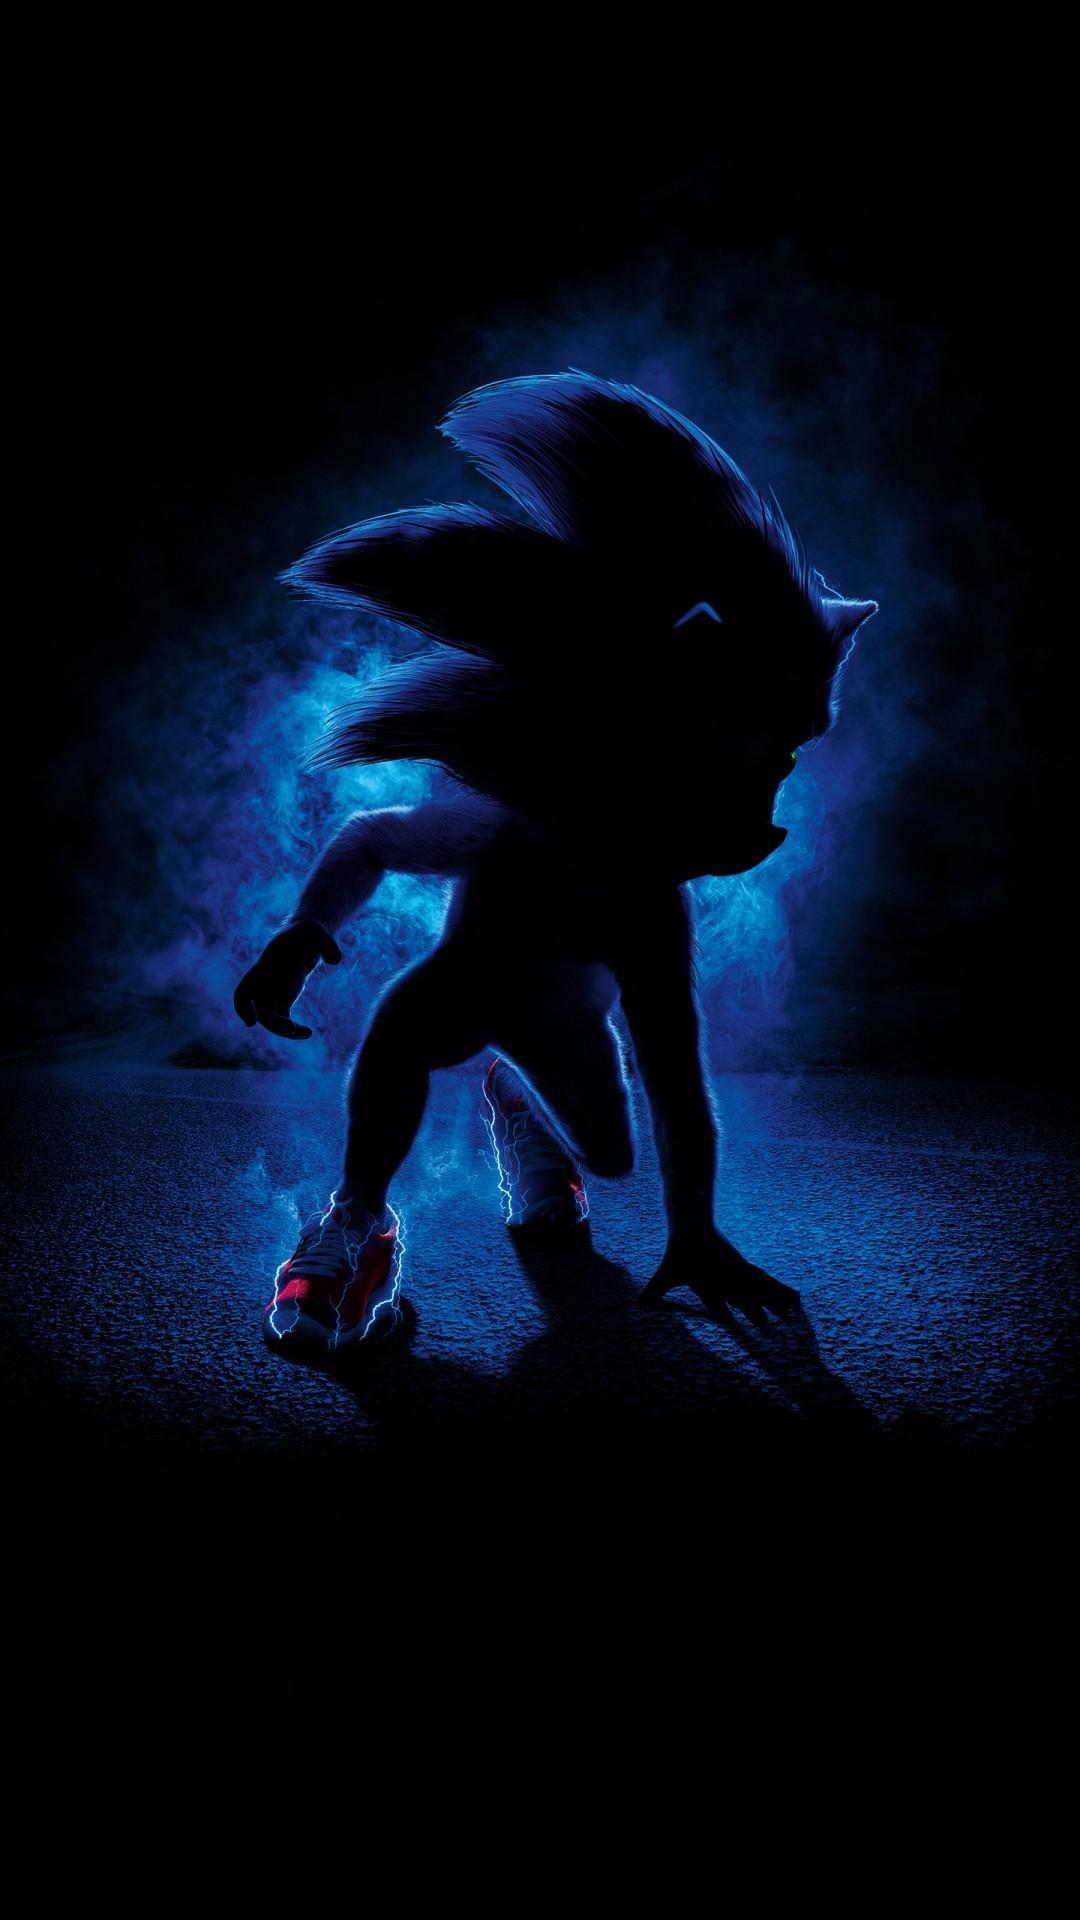 Free Sonic the Hedgehog phone wallpaper by phreshkiddldd